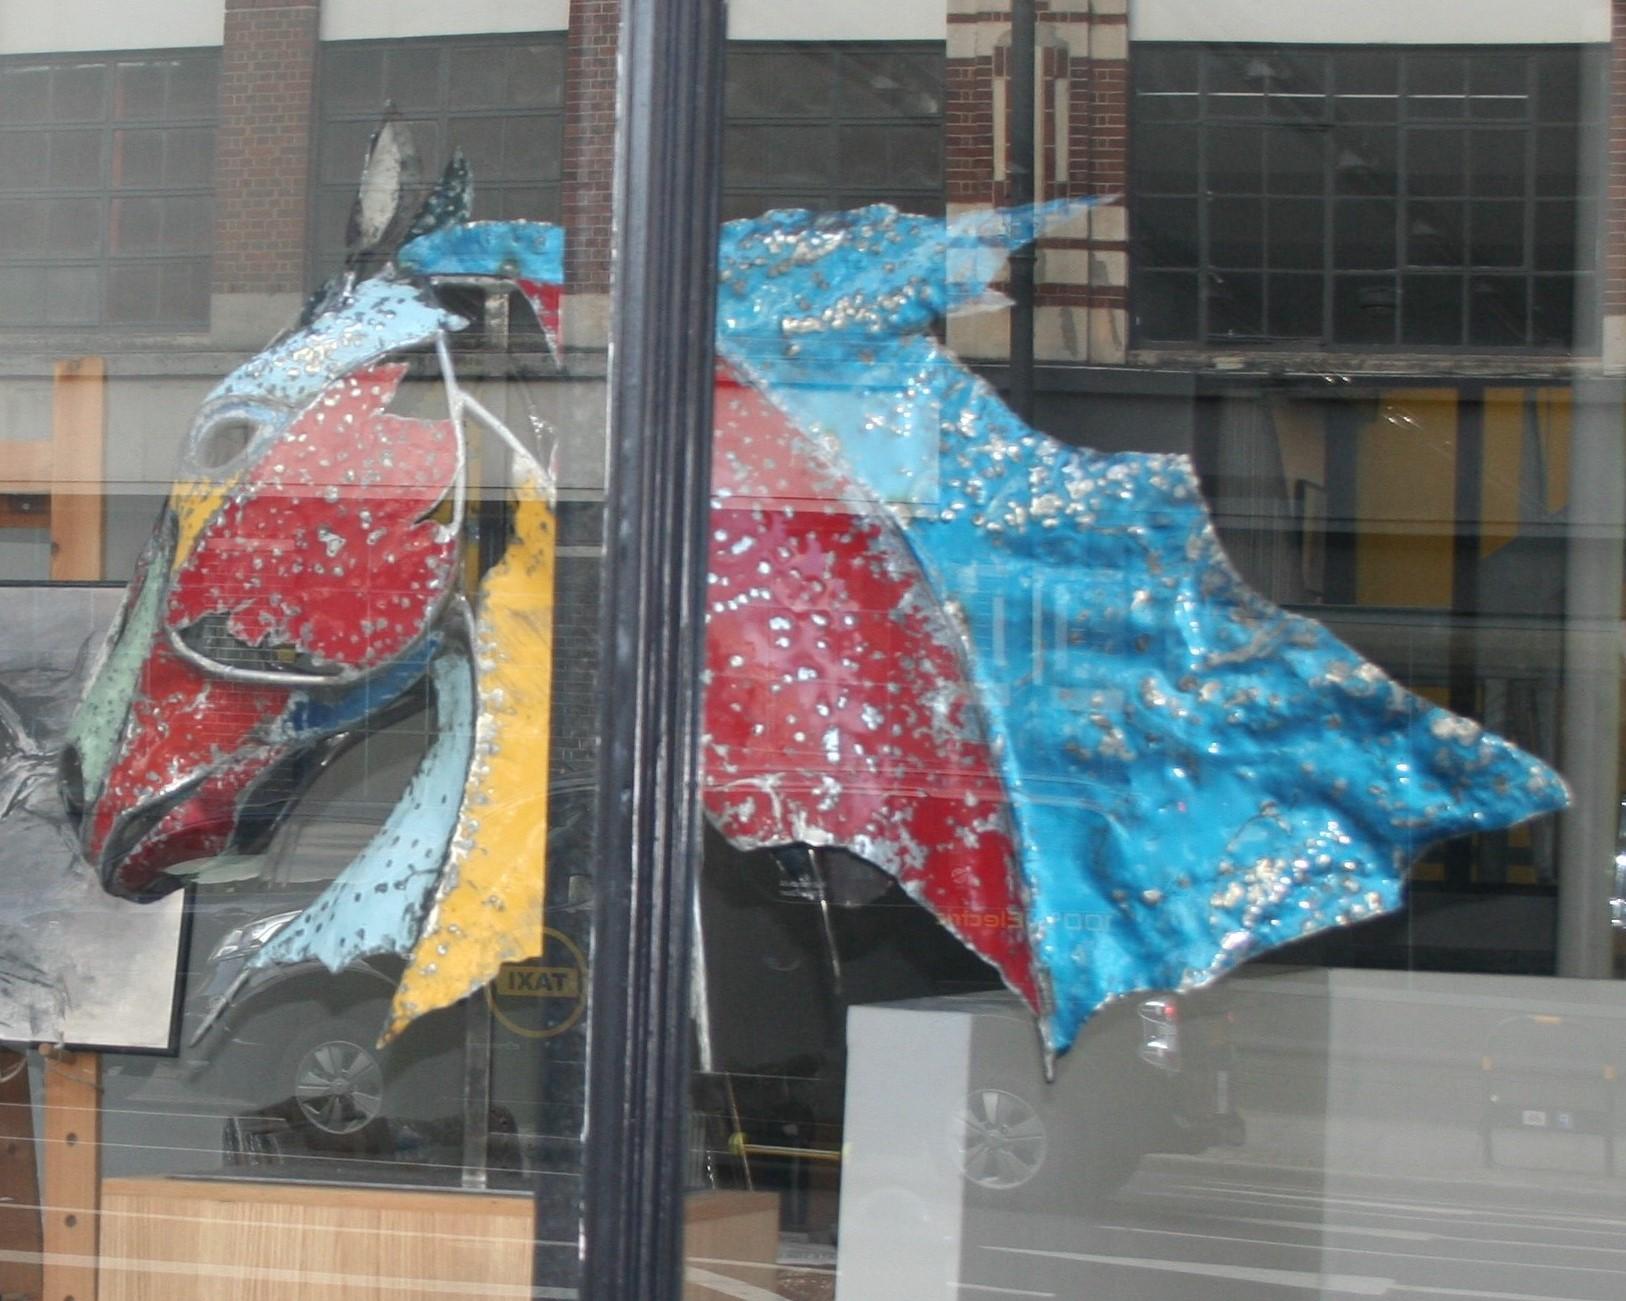 Galleria Balmain pop-up contemporary Art gallery opening